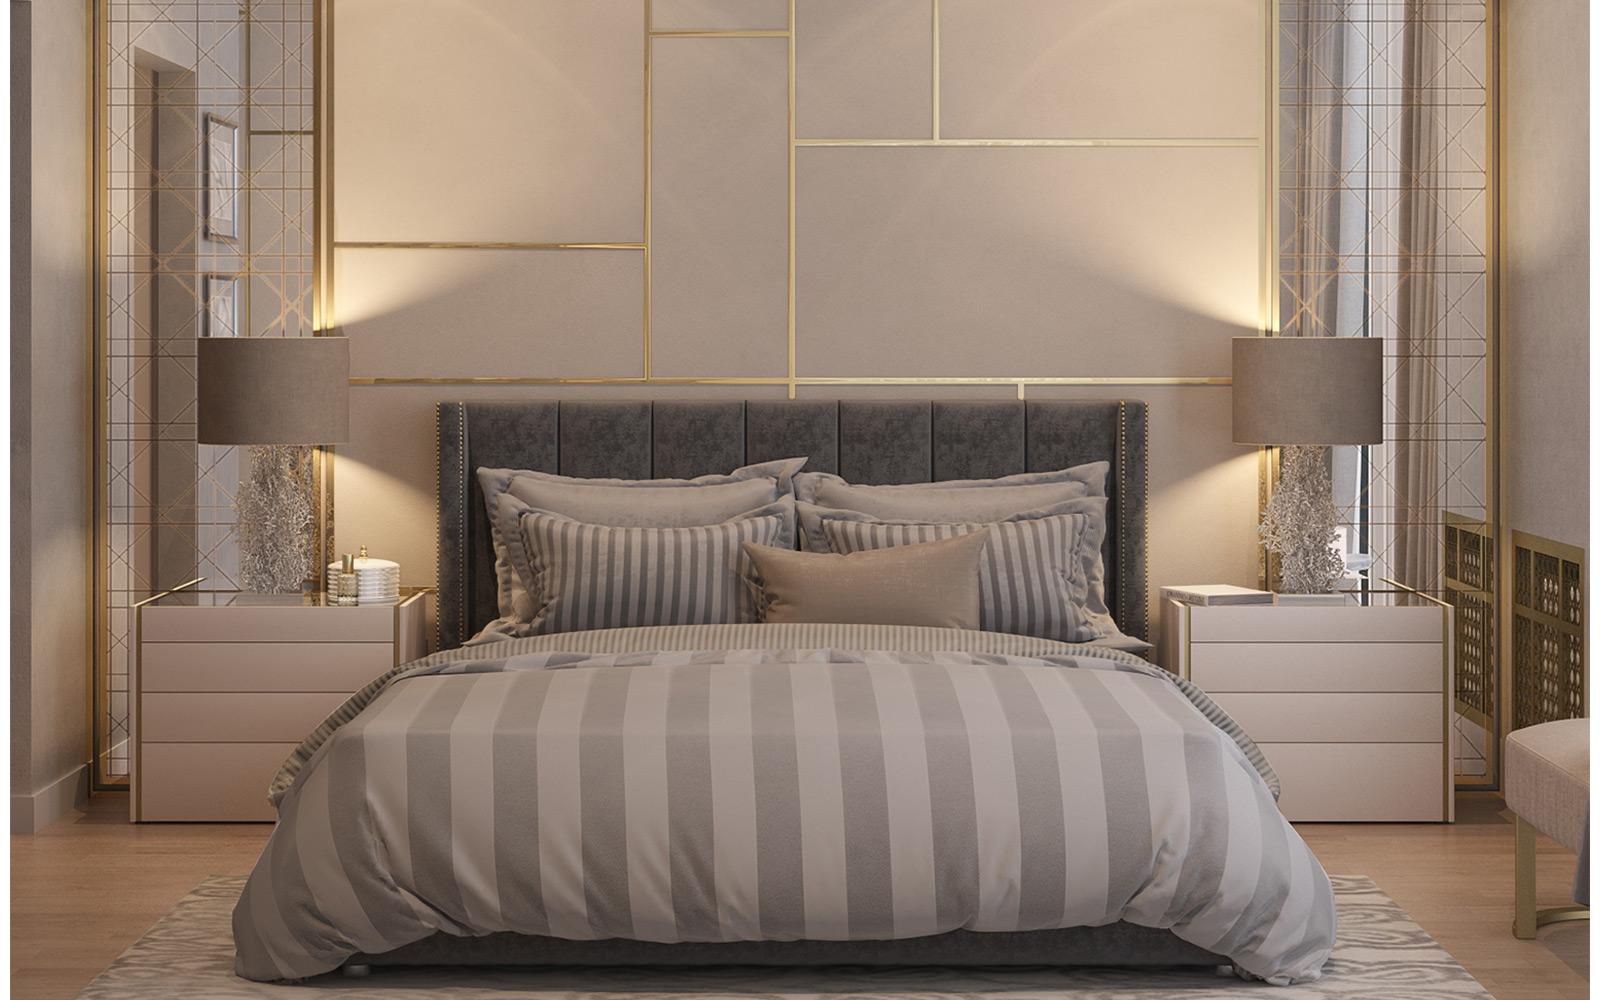 Vogue Design - Istanbul Yeni Moda Flat7